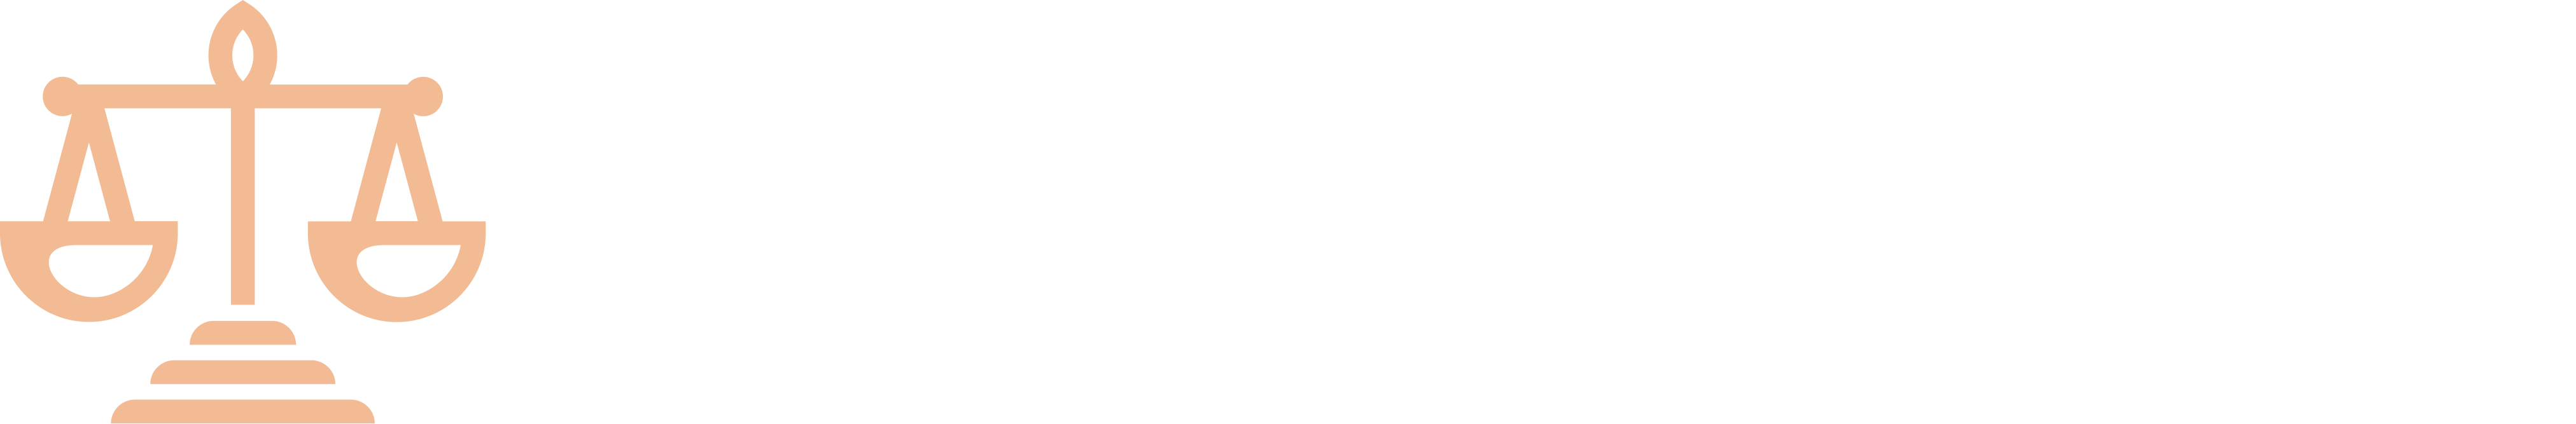 South Dakota Bankruptcy Aid Logo